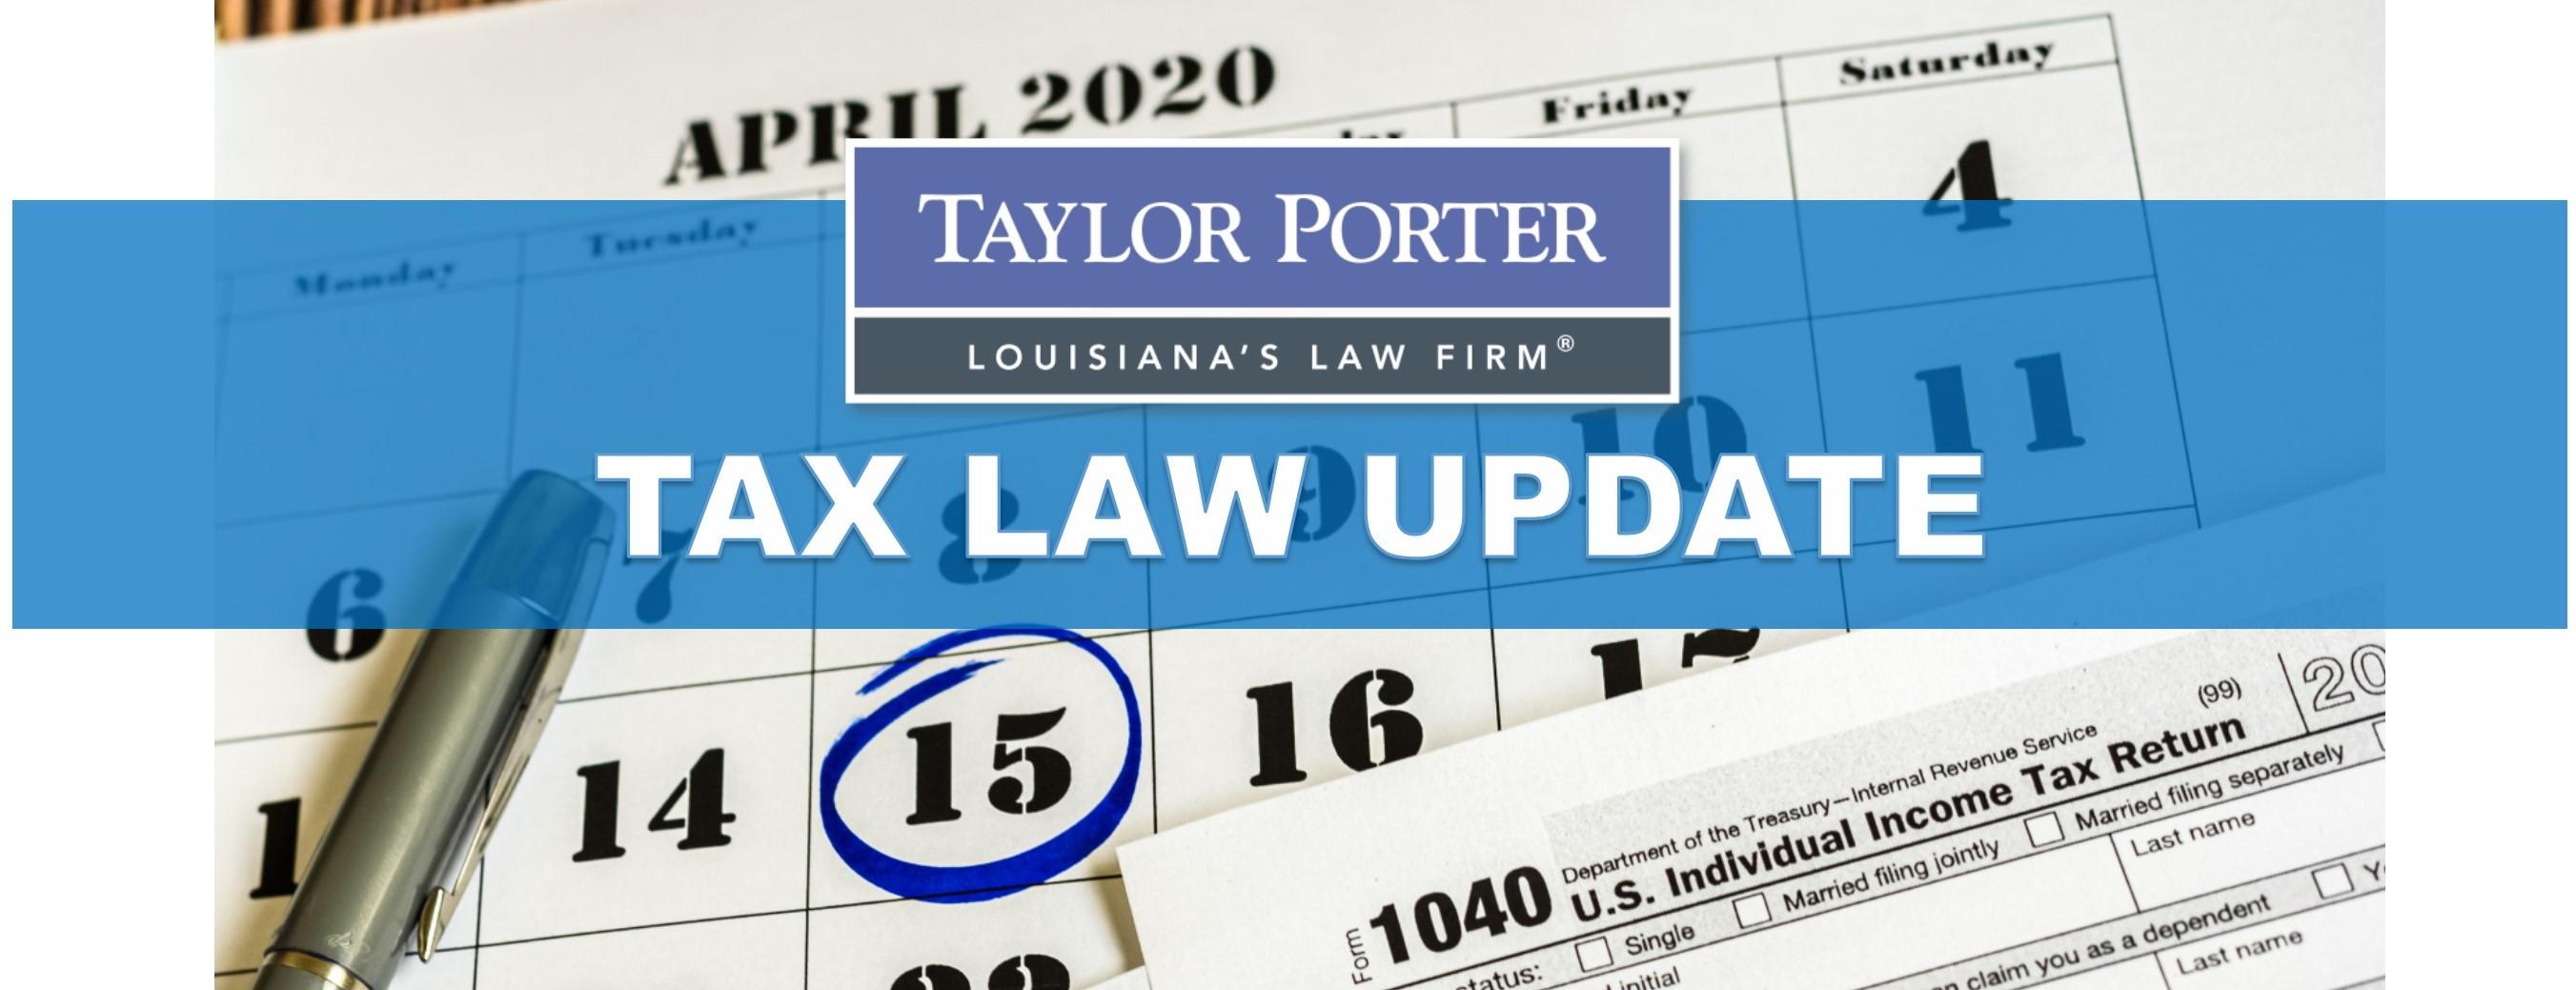 Taylor Porter